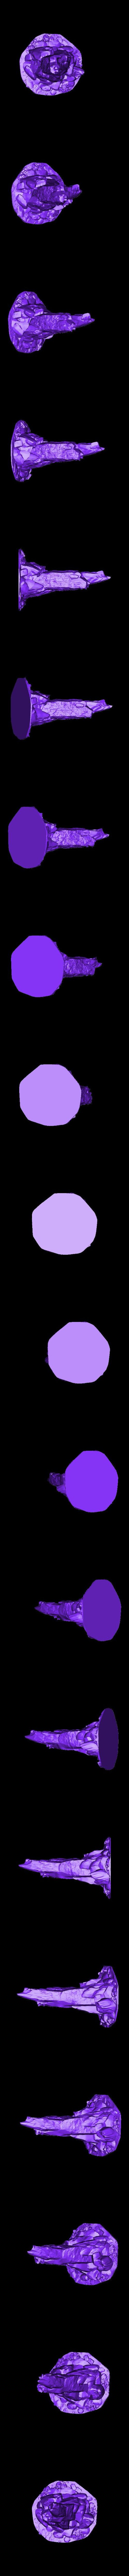 Rocks_01.stl Download STL file ROCKY TERRAIN • 3D printing object, Txarli_Factory